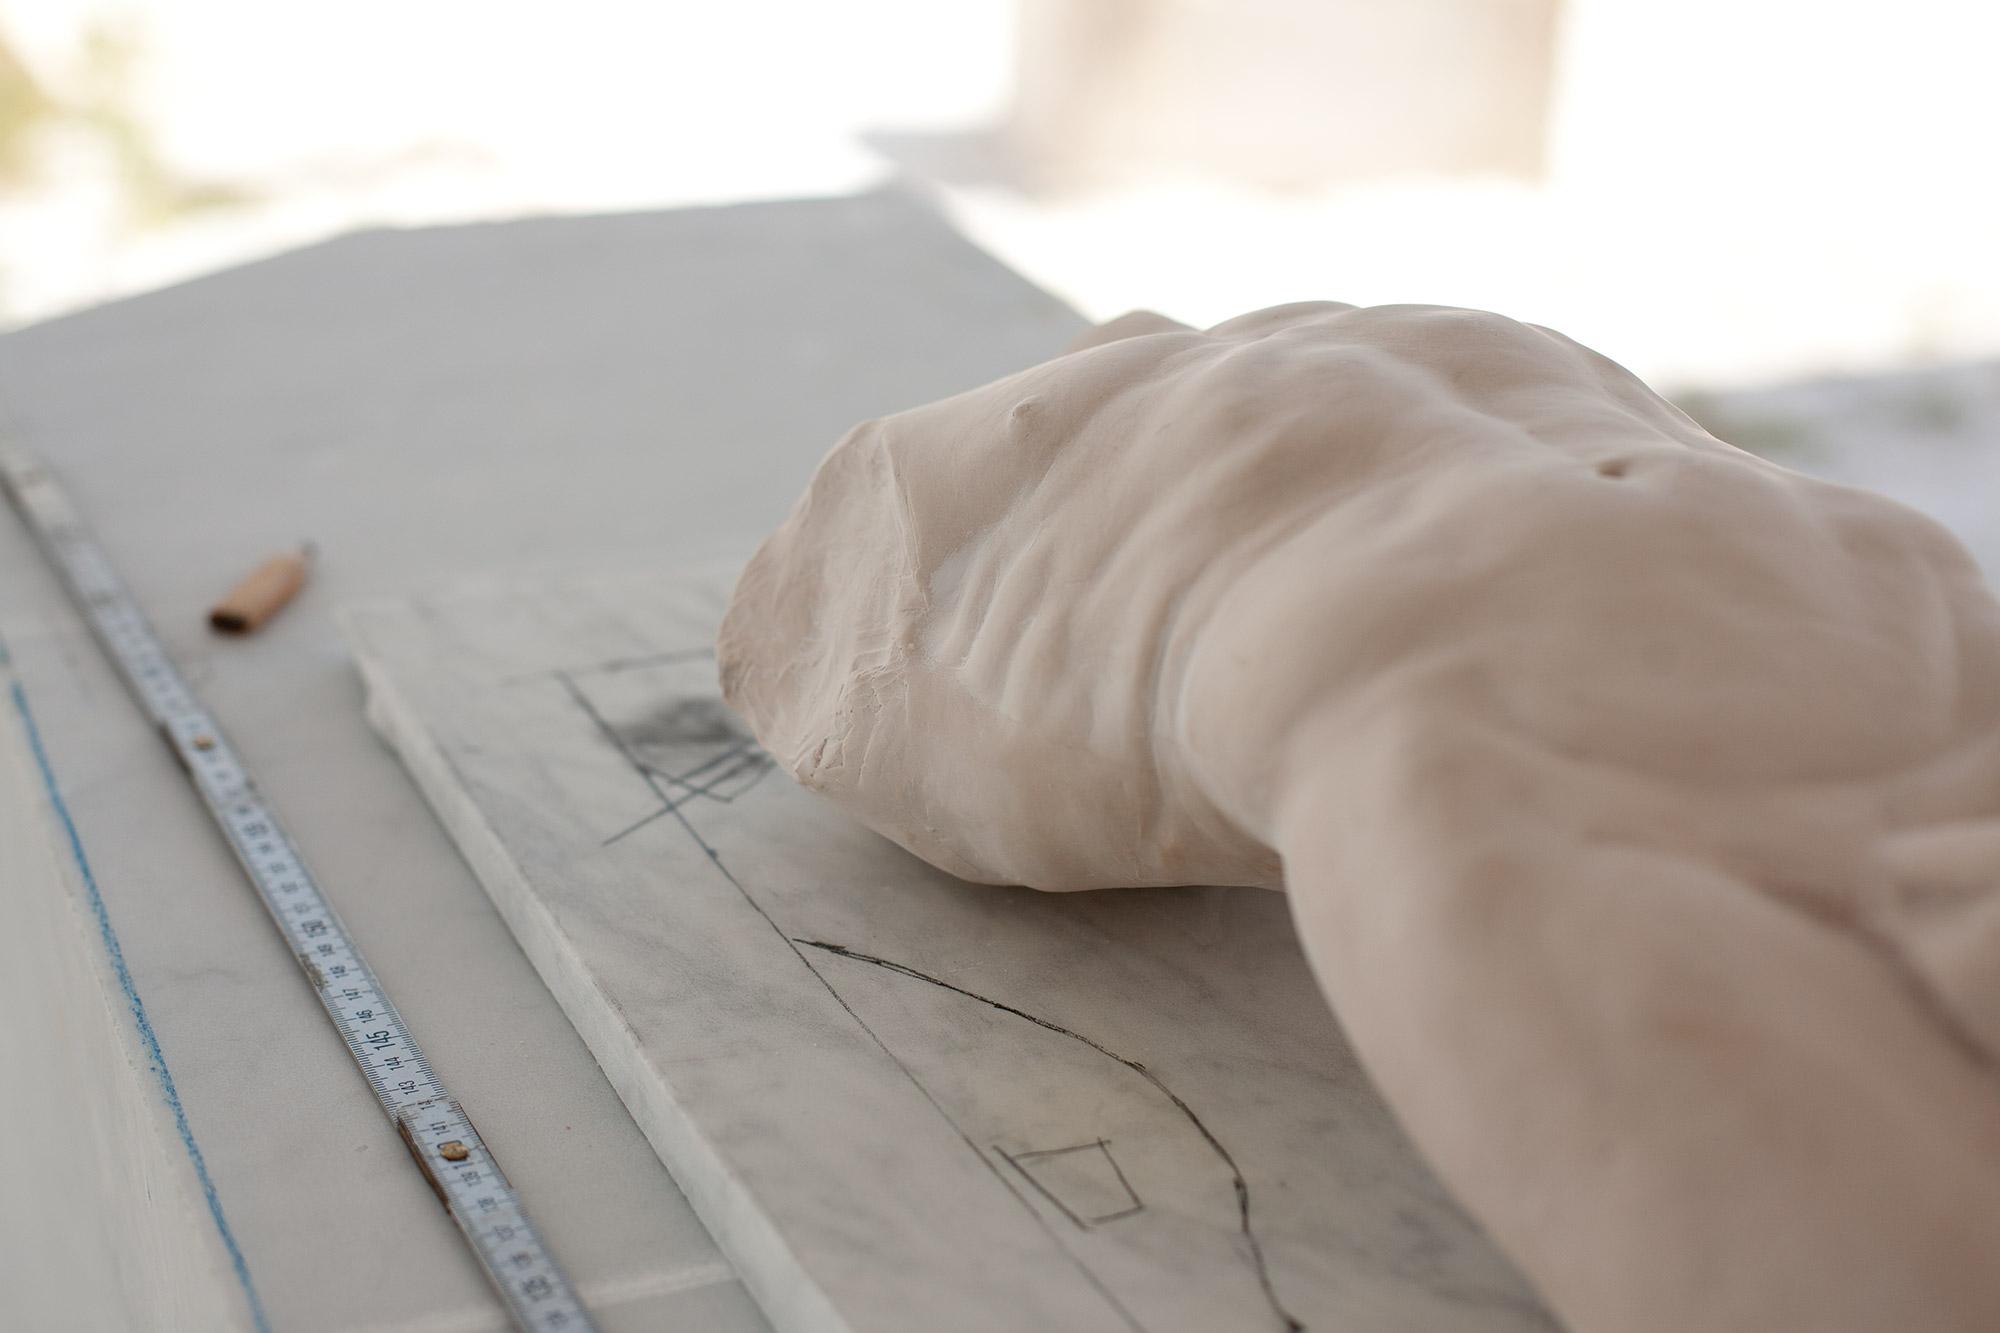 New-York-Academy-of-Art-Carrara-Residency-Joseph-Brickey20171213_0079.jpg